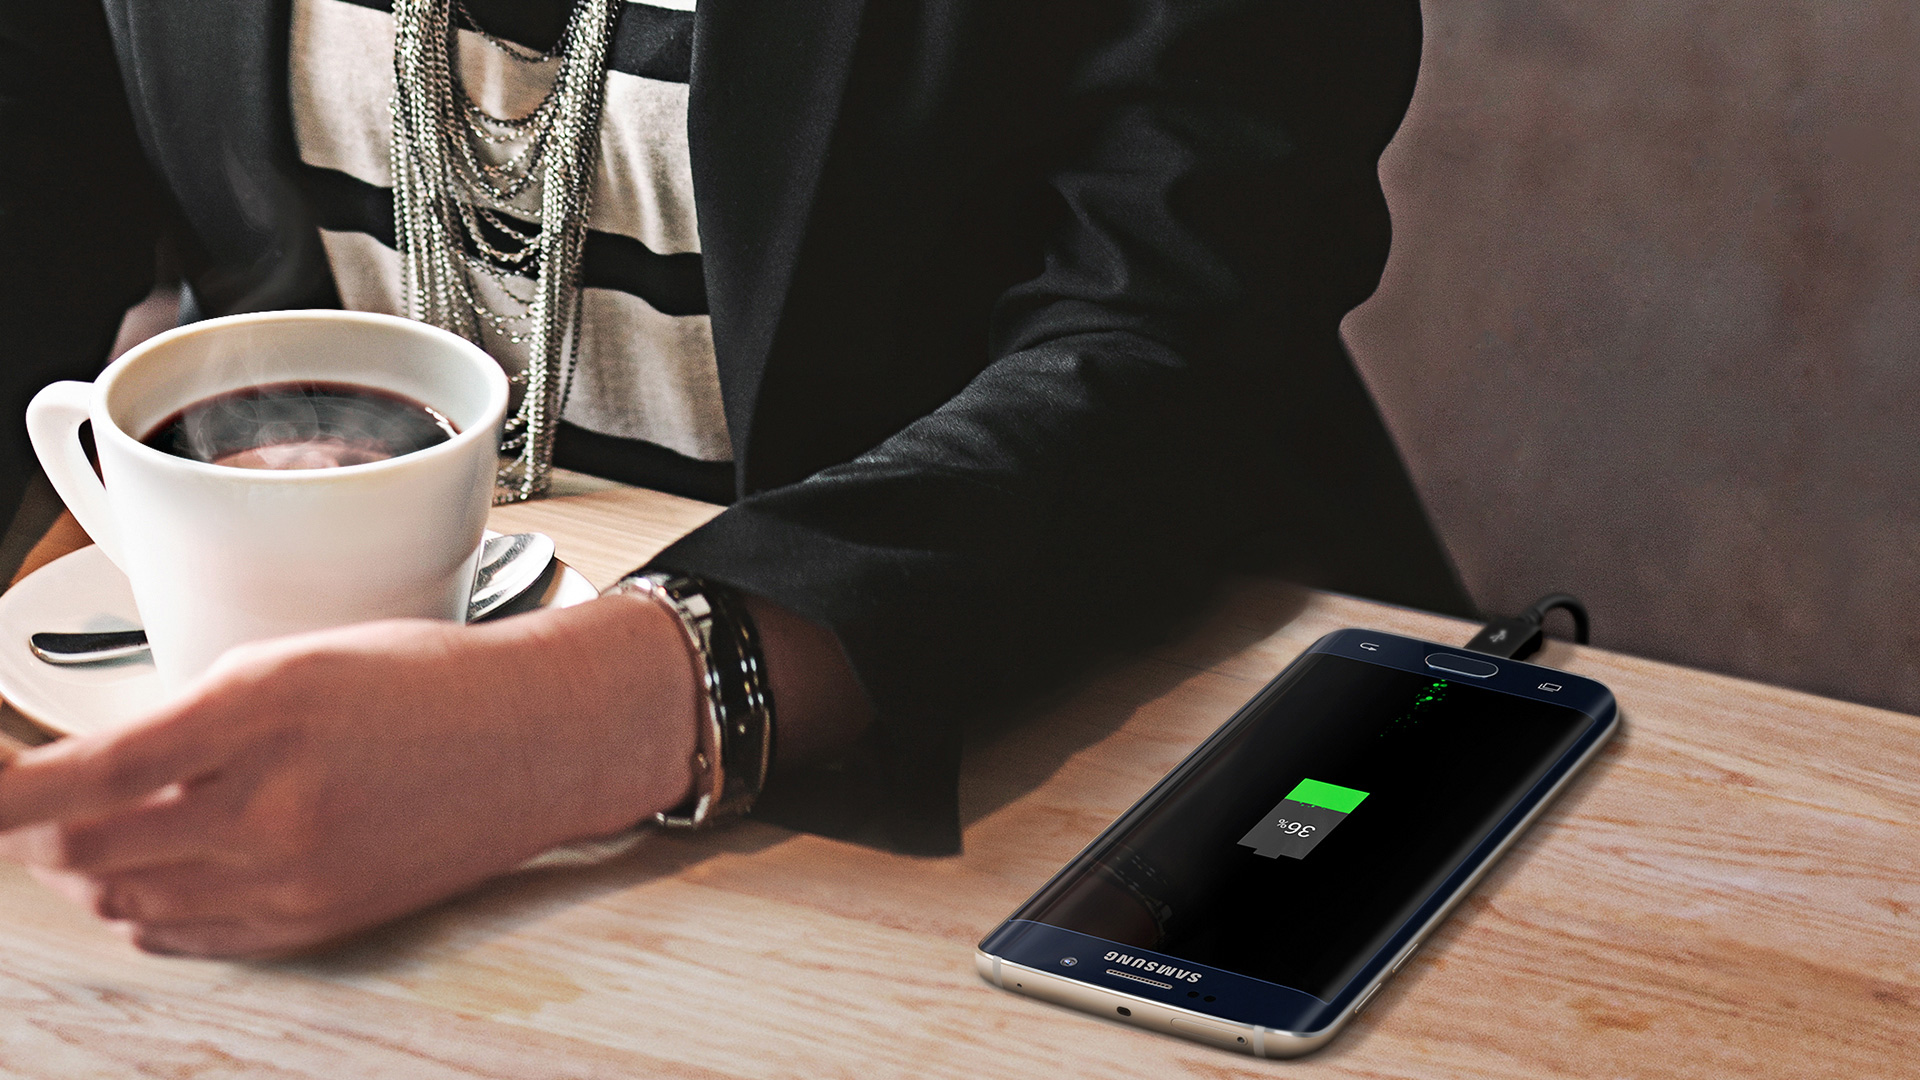 Samsung Galaxy s6 - ricarica